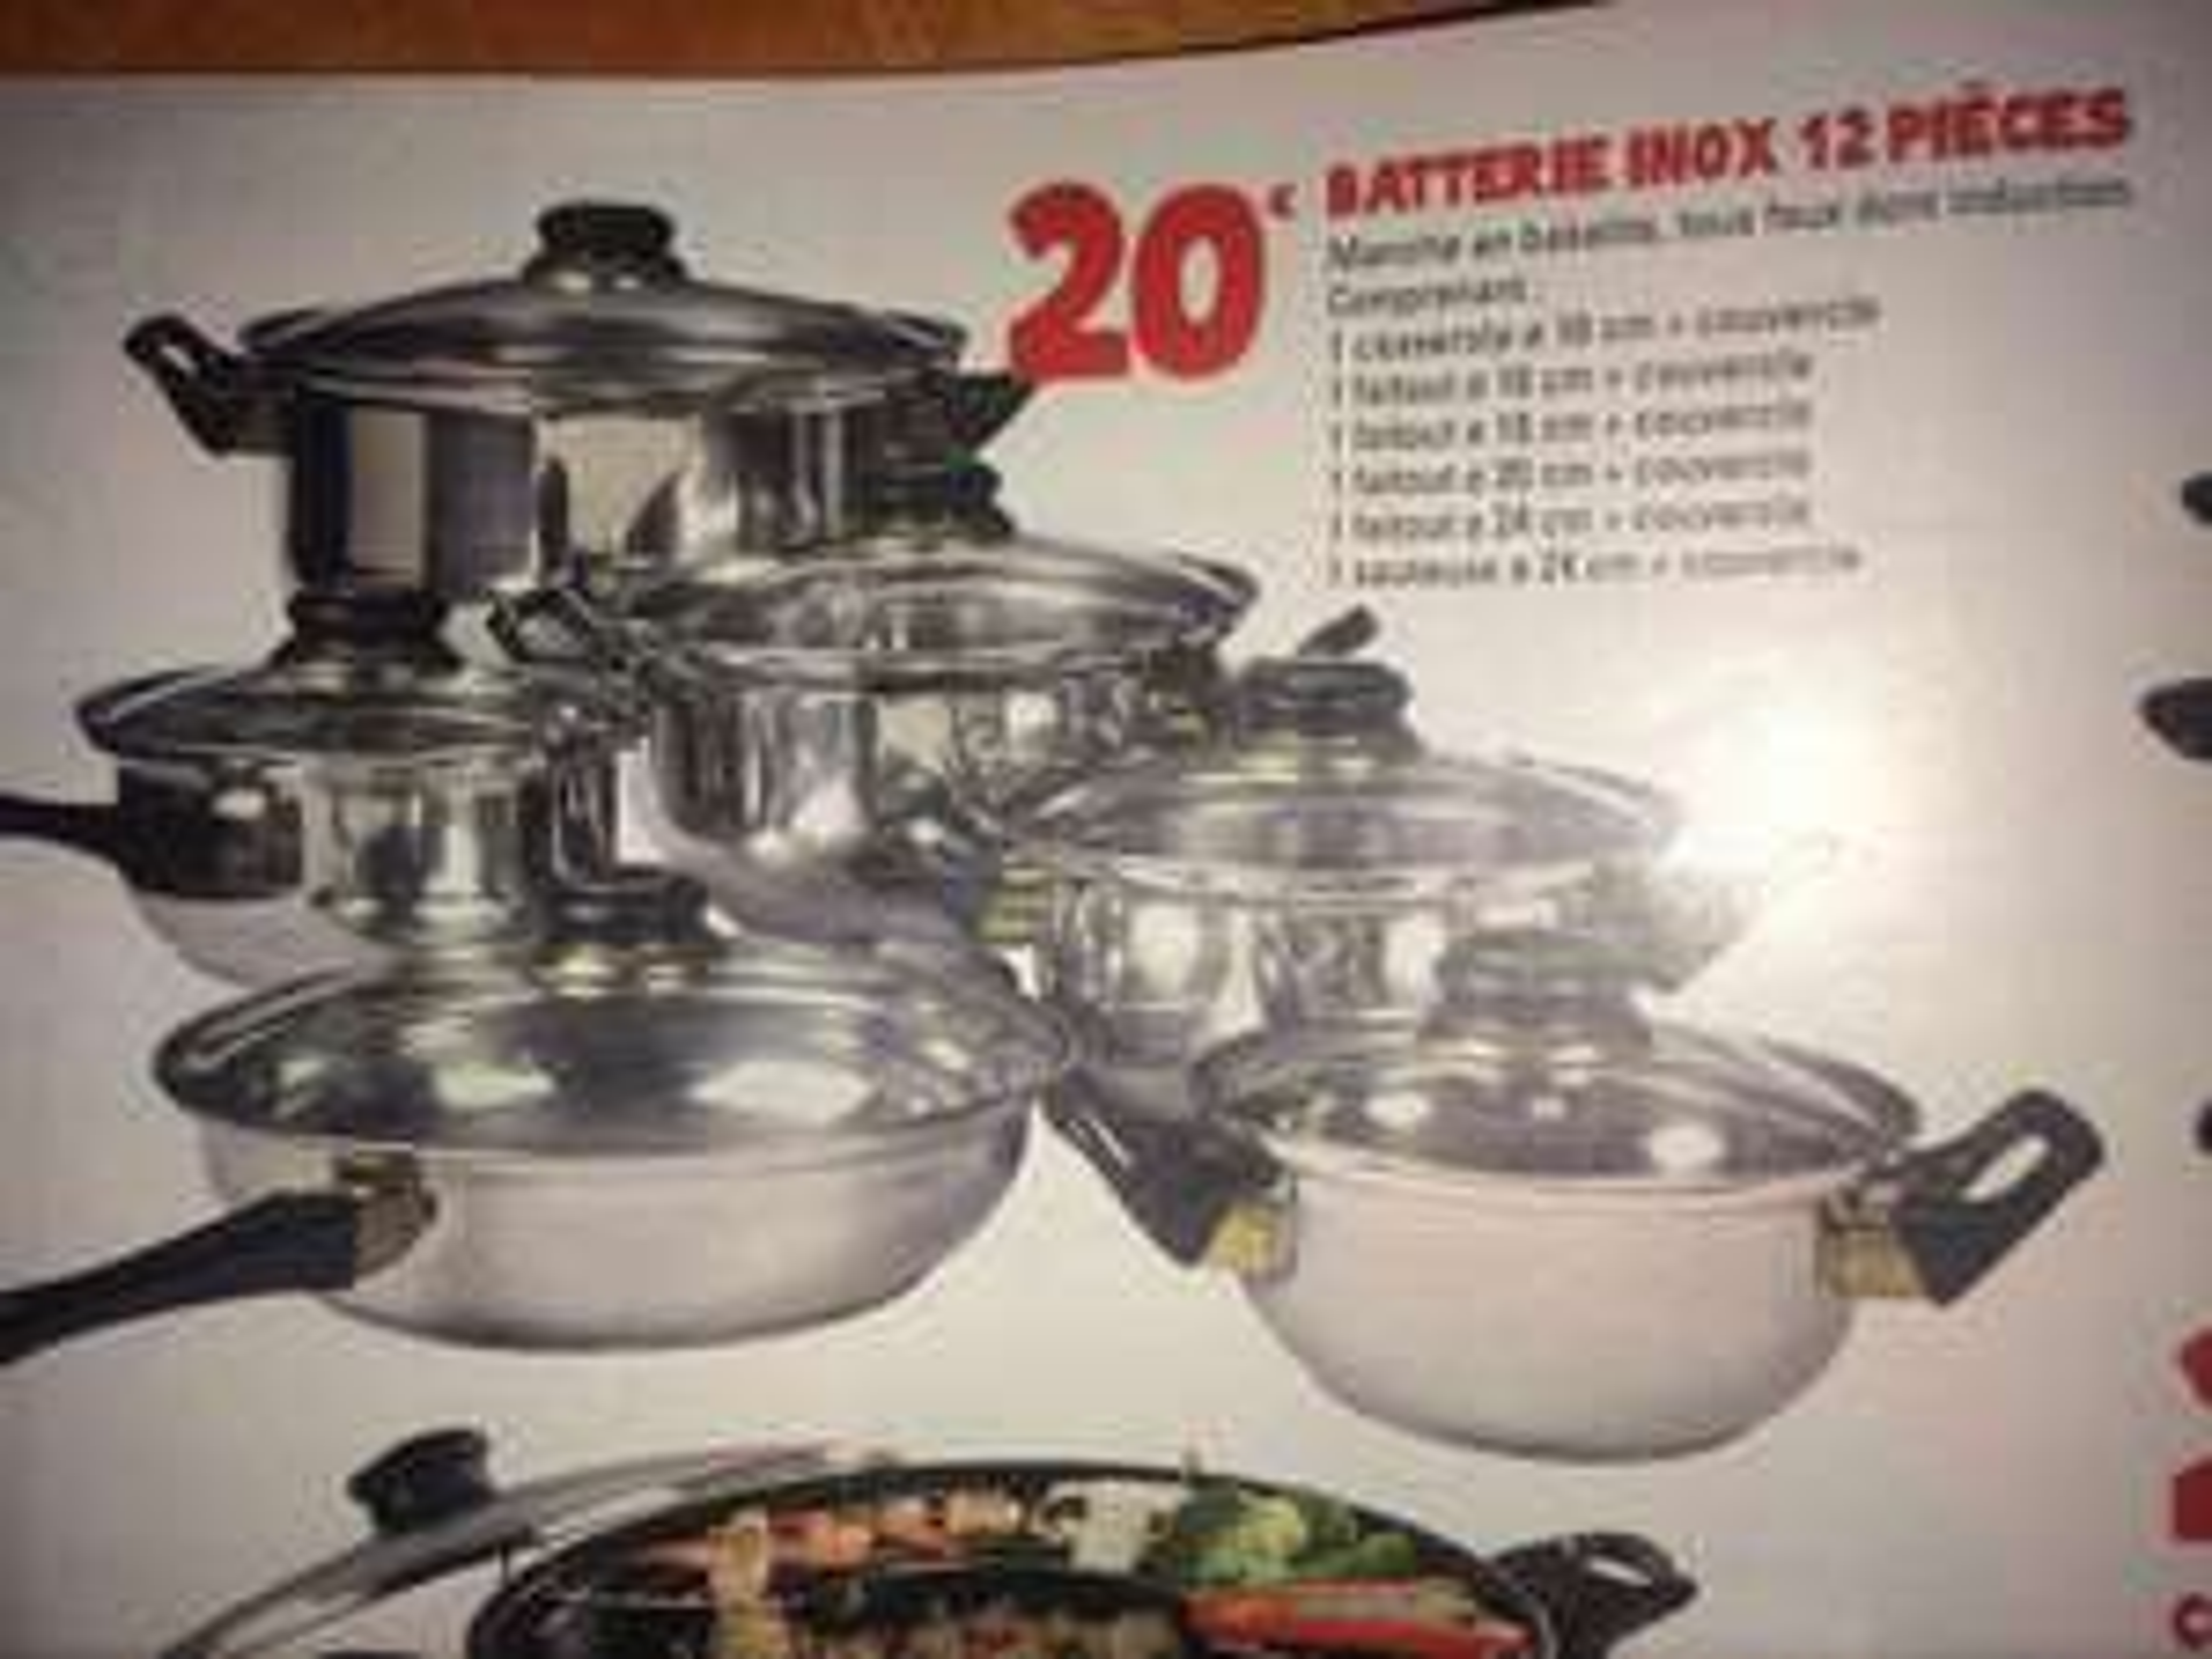 Batterie de cuisine en inox - 12 pièces